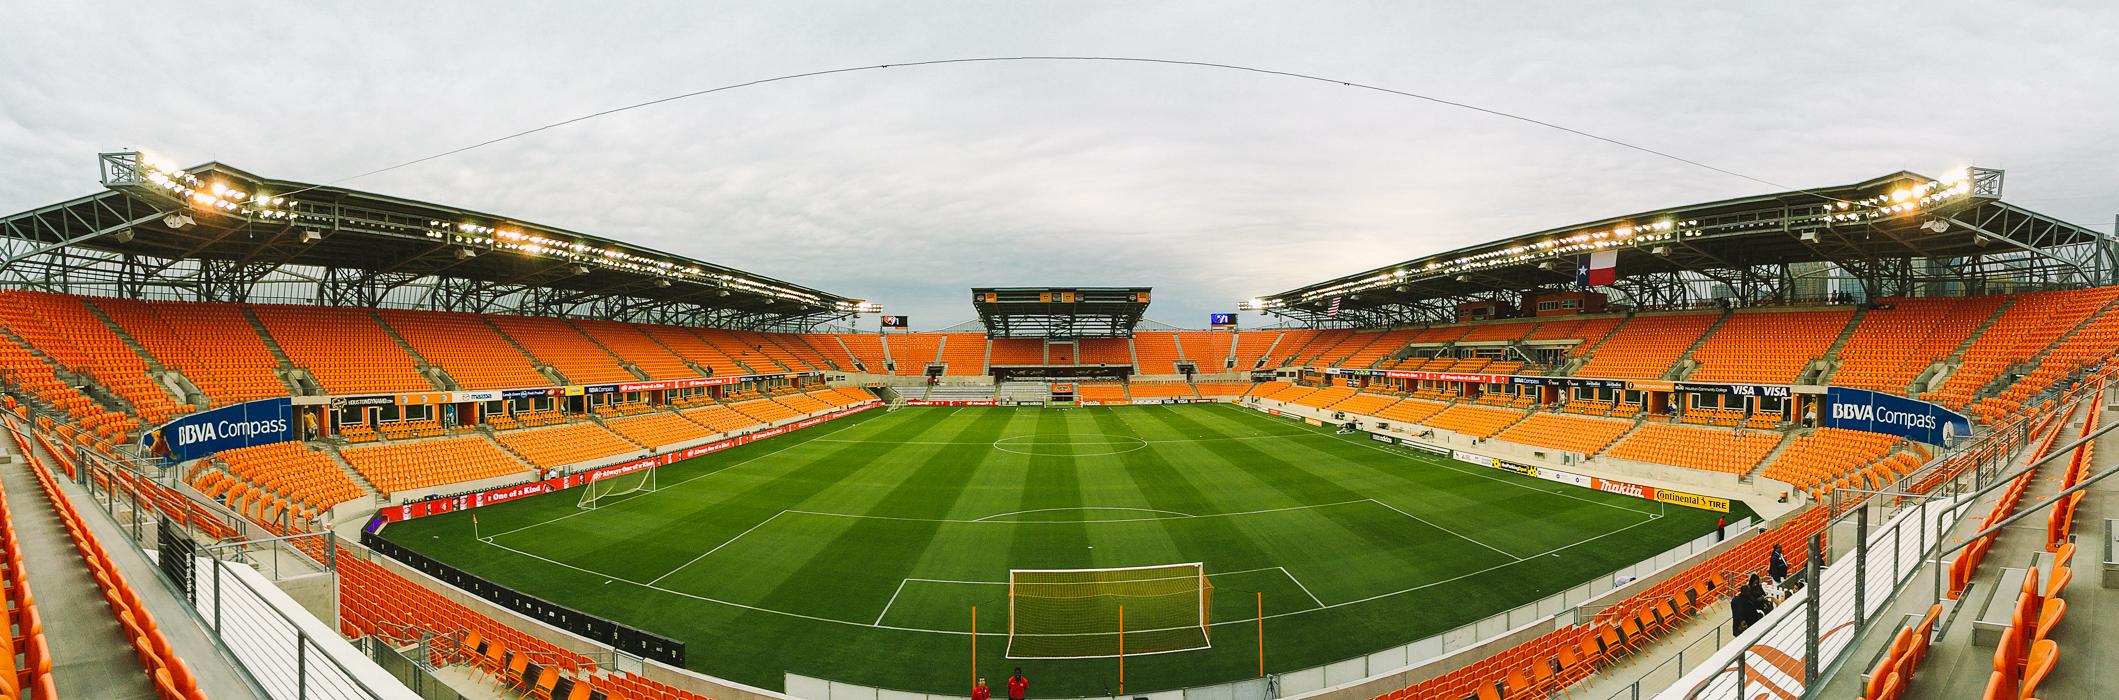 BBVA Compass Stadium - April 5, 2014 // iPhone 5S Panorama